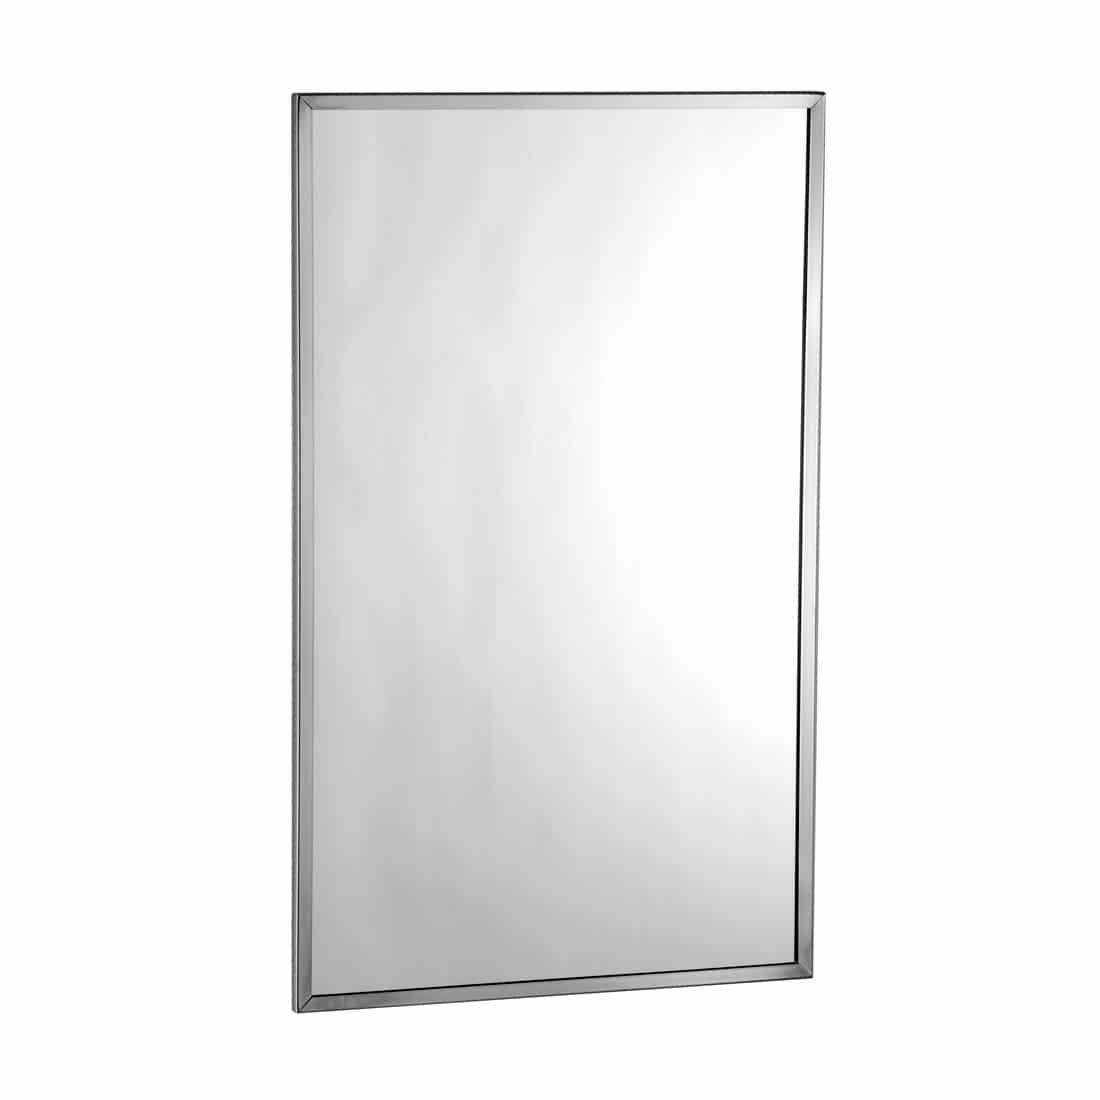 Bobrick Channel Frame Mirror B 165 Stainless Steel